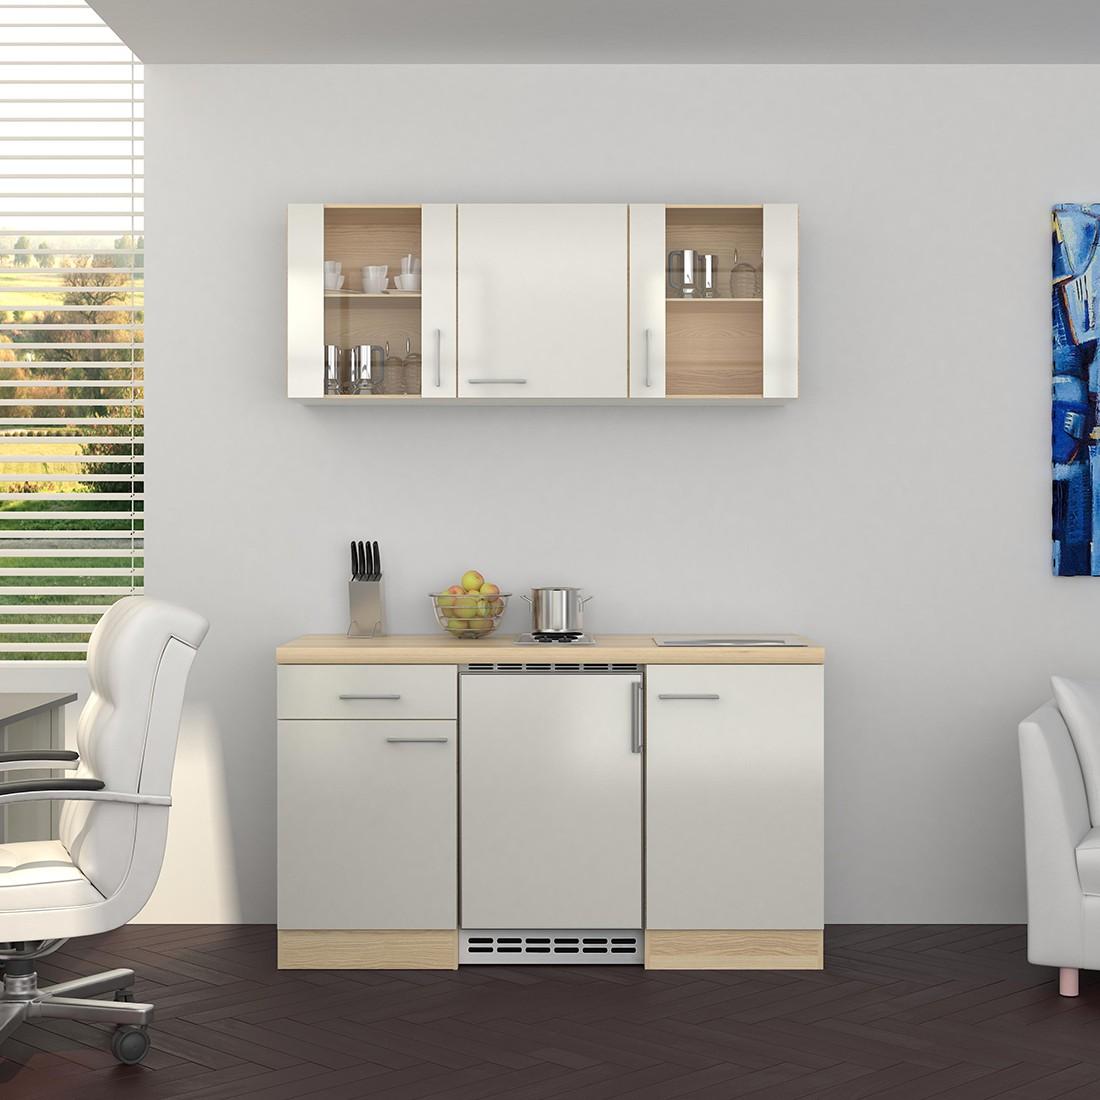 singlek che florenz 9 teilig 2 glash nger breite 150 cm perlmutt wei k che singlek chen. Black Bedroom Furniture Sets. Home Design Ideas